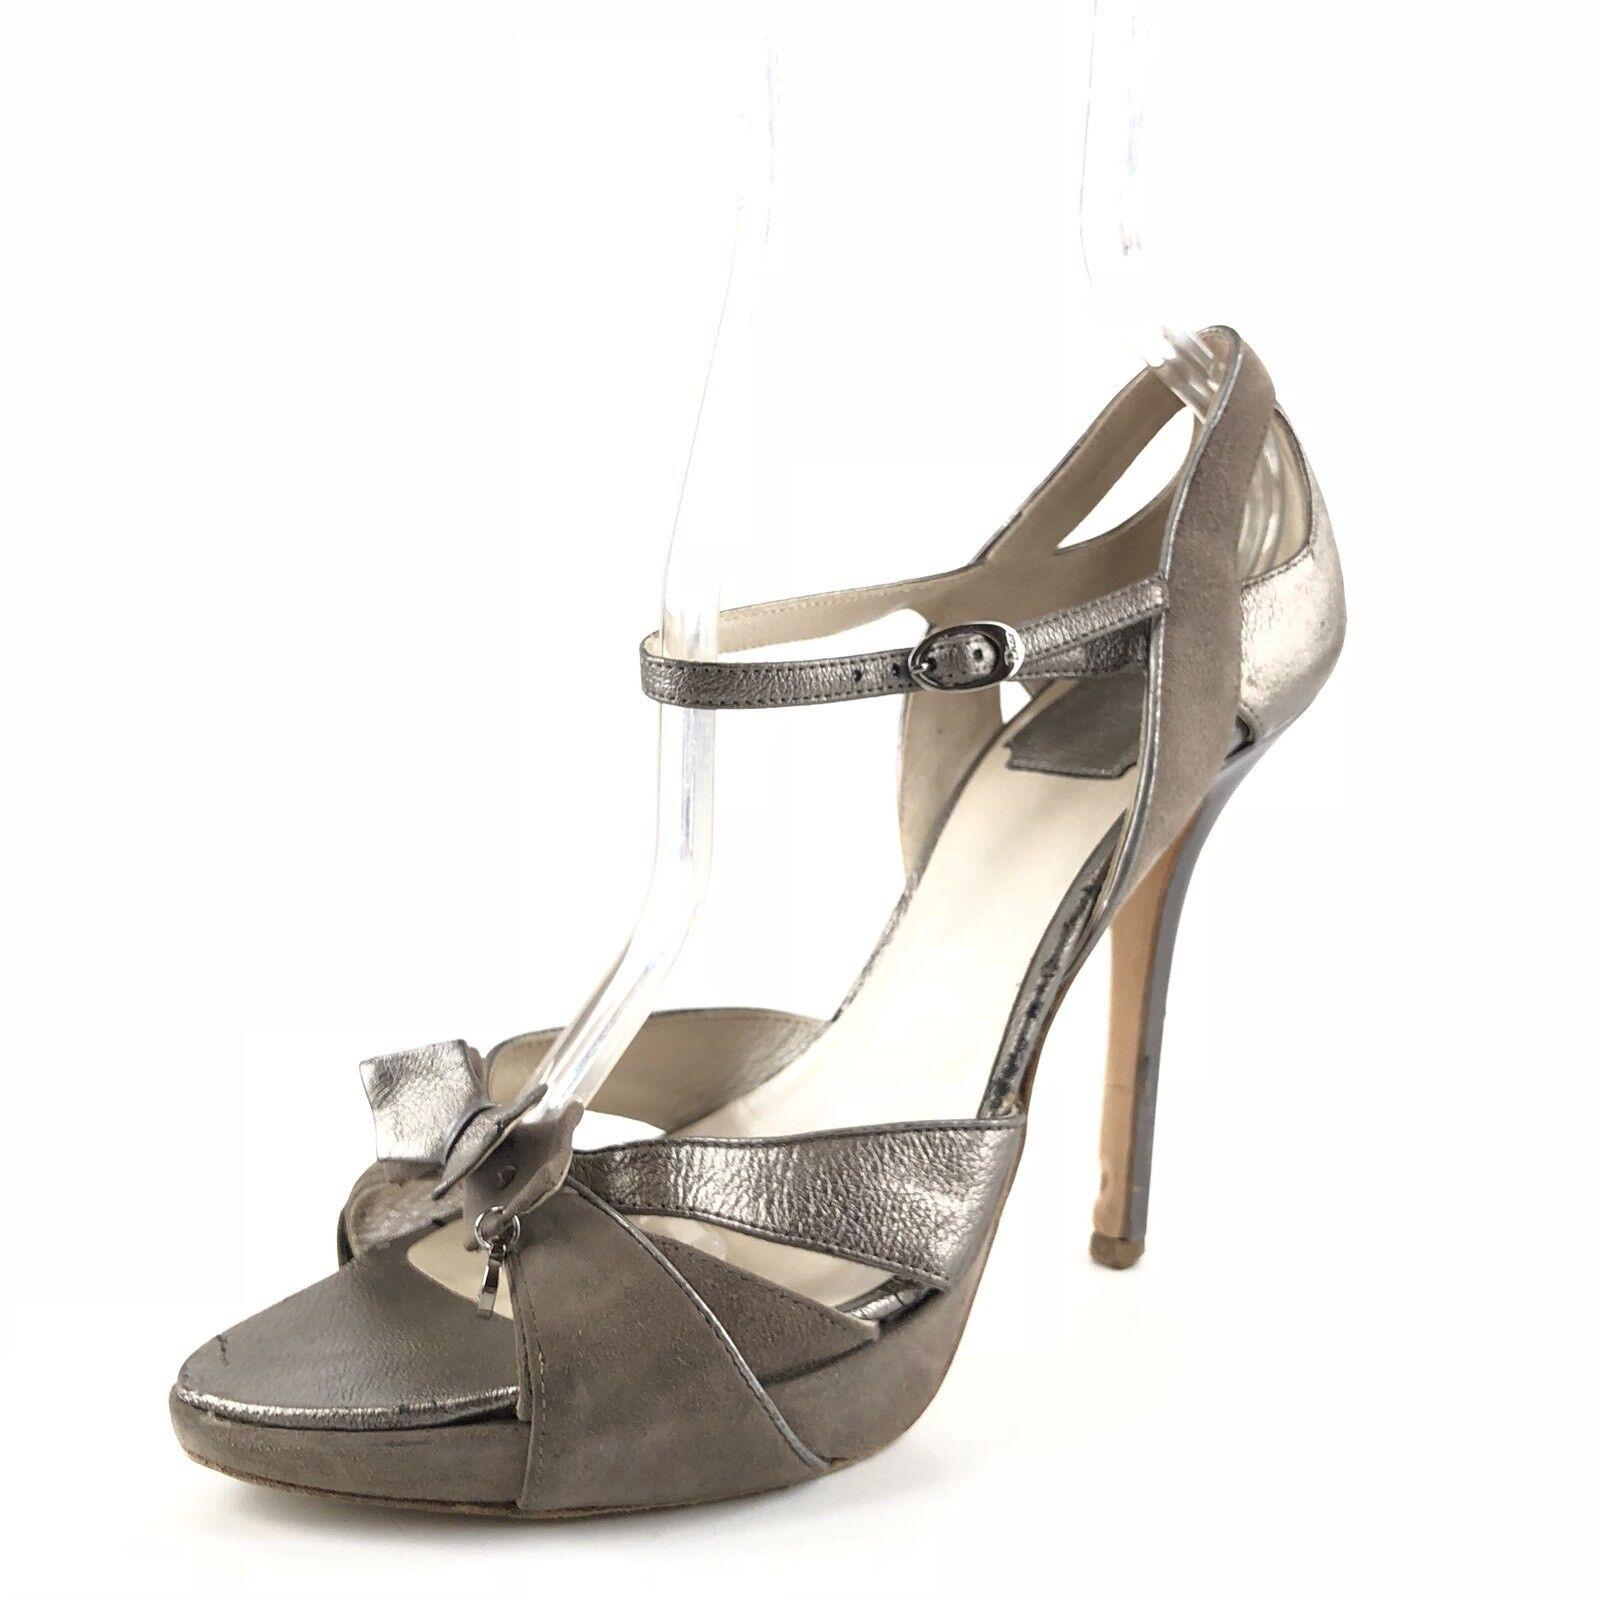 Christian Dior Platinum Leather Ankle Strap Platform Sandals Womens Size 37 M